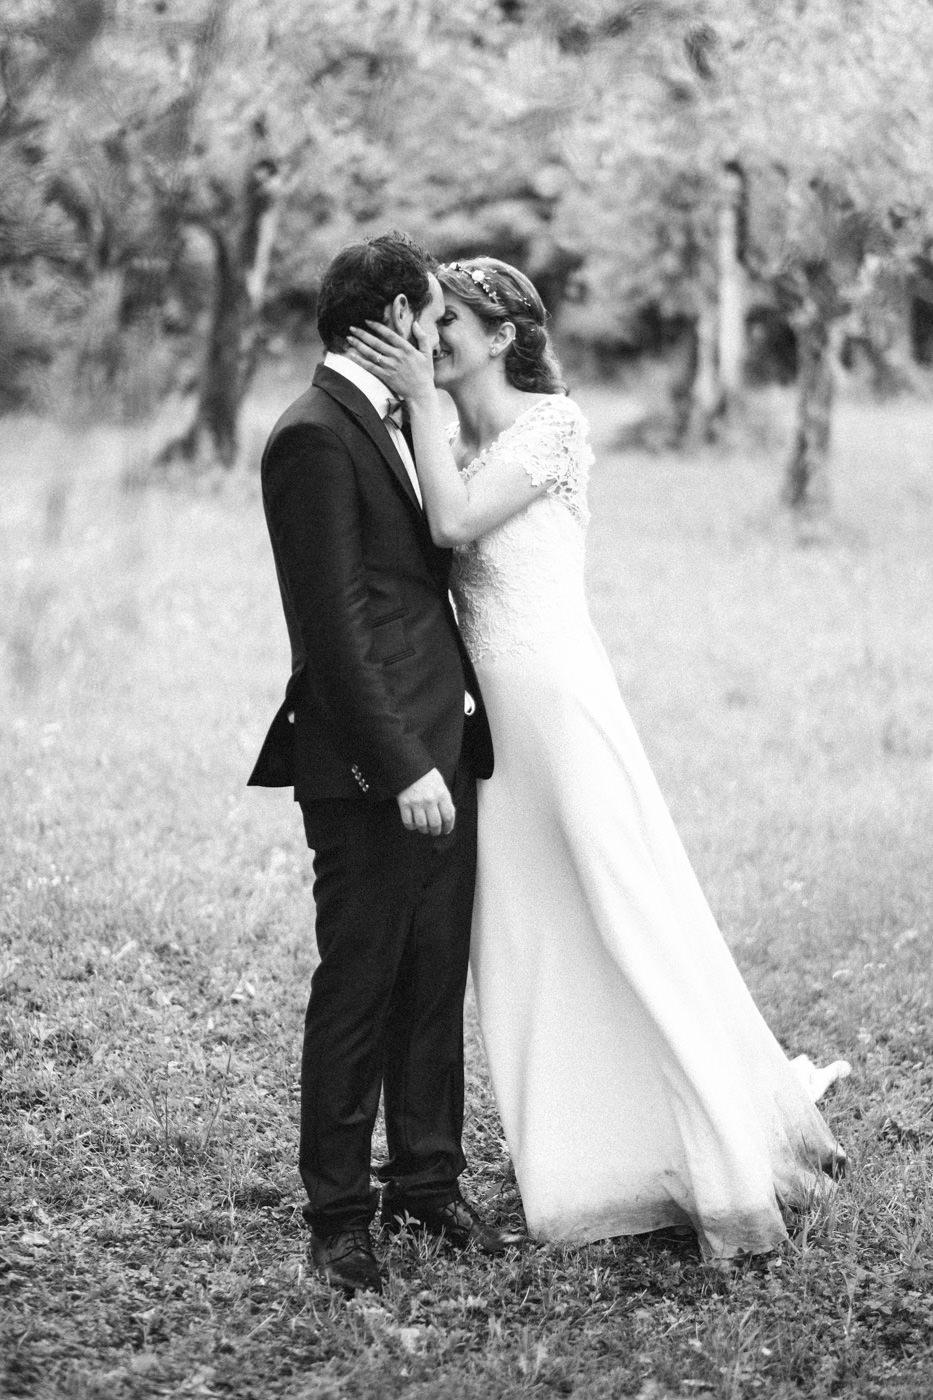 matrimoni_all_italiana_fotografo_matrimonio_toscana-59.jpg